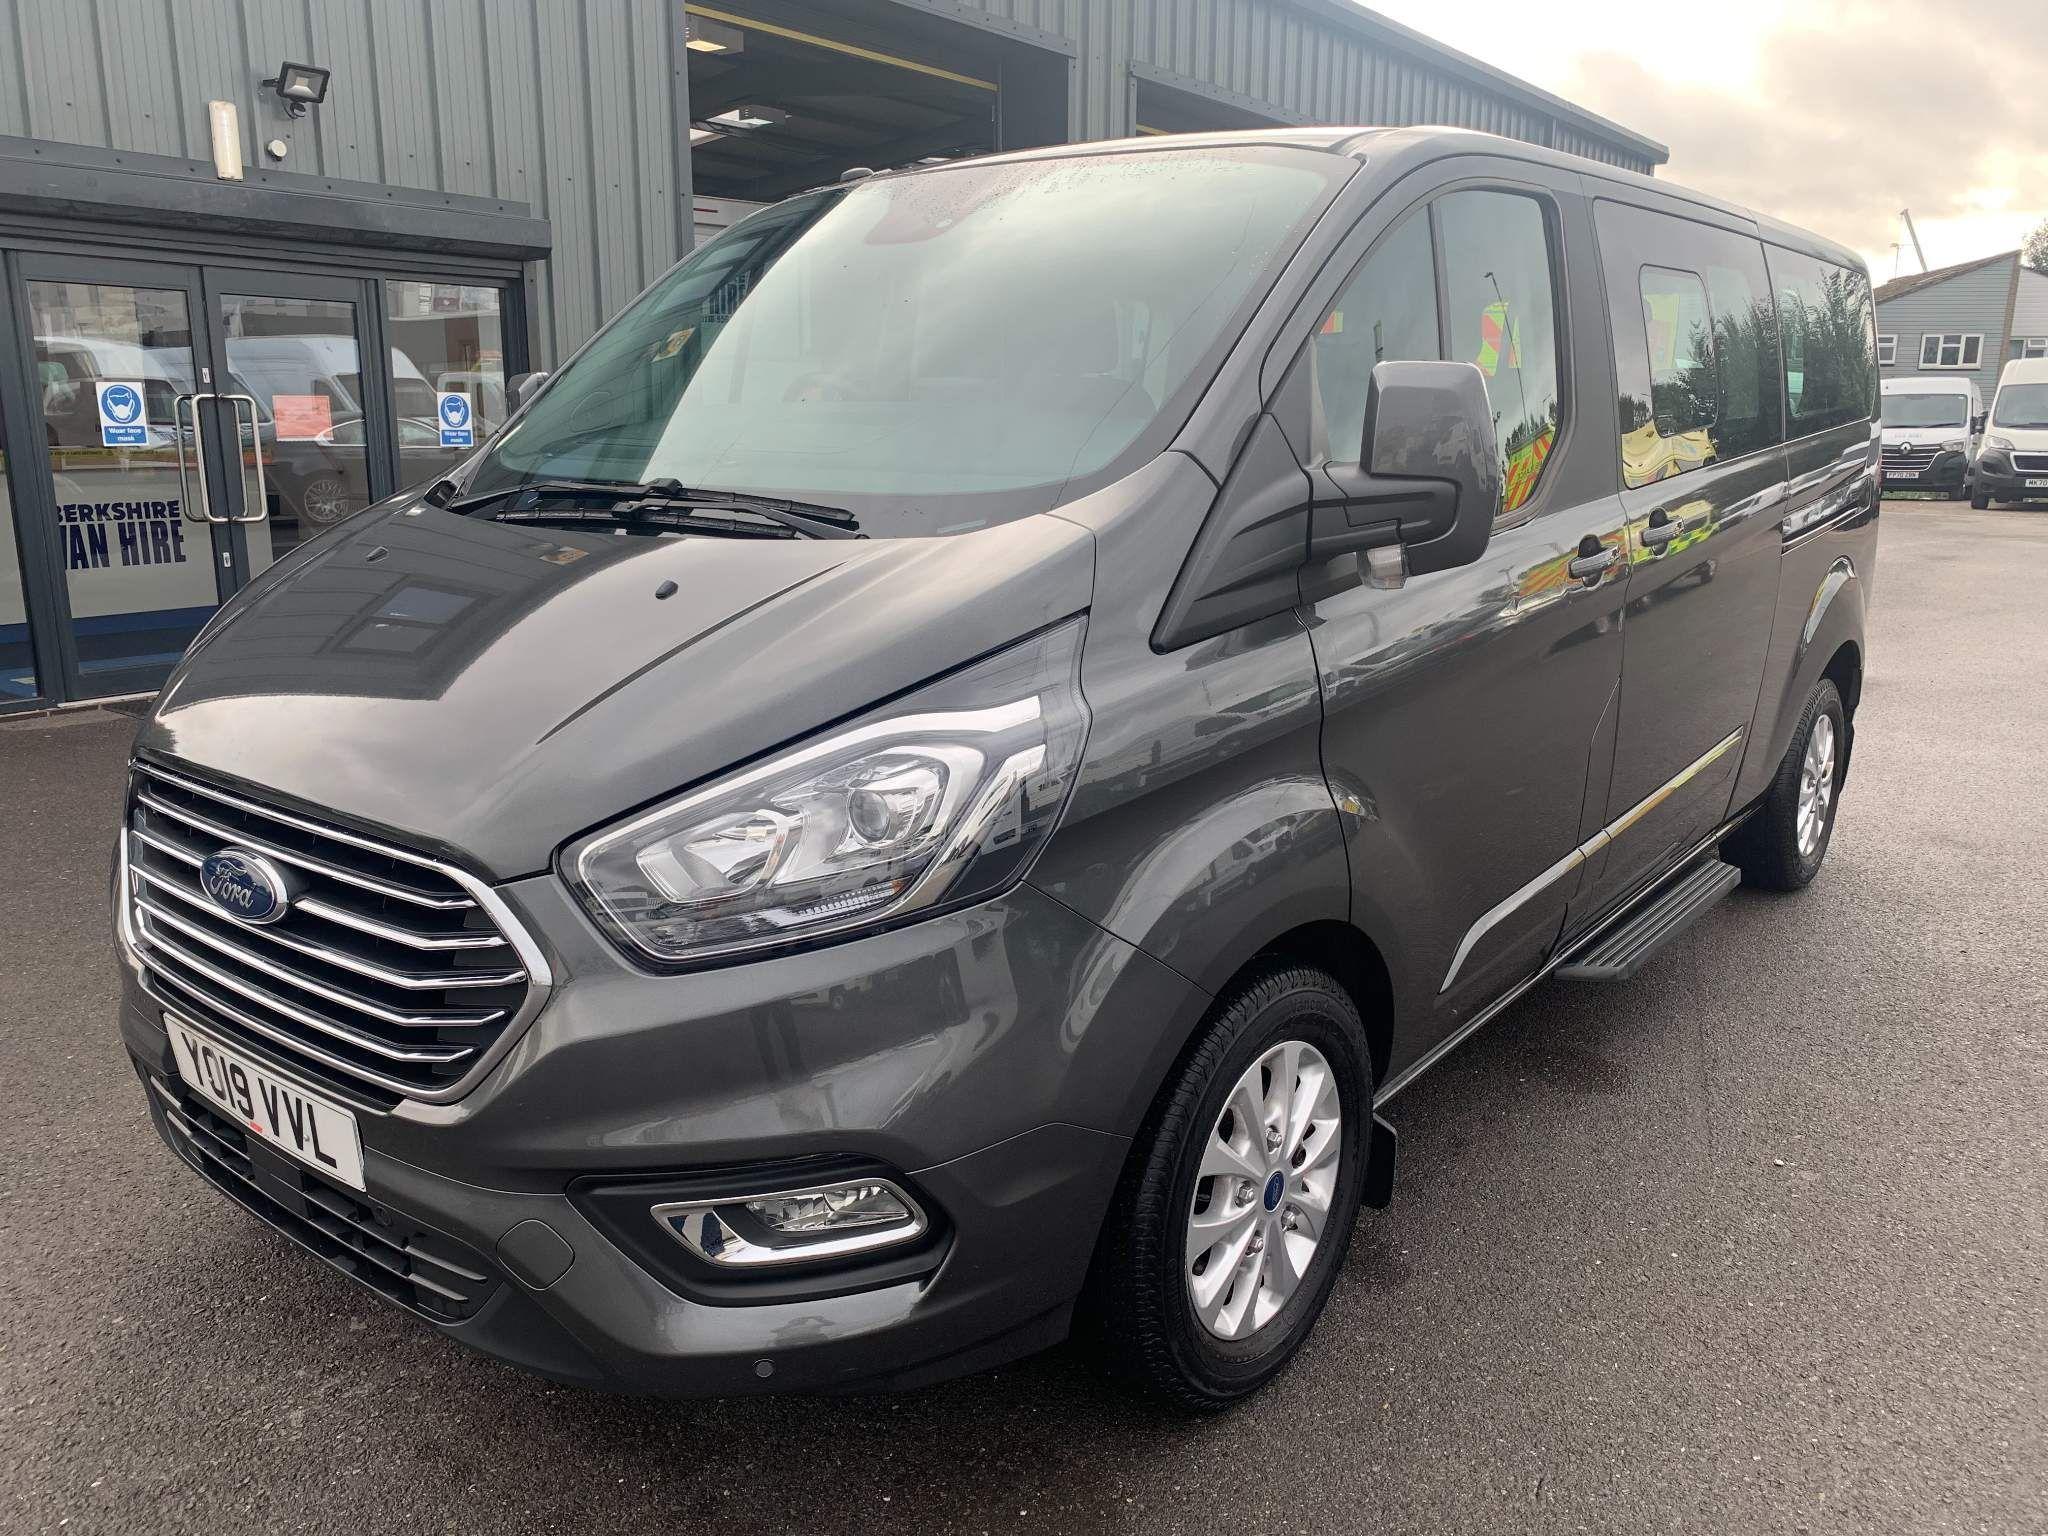 FordTourneo CustomMini Bus 9 Seater For Sale